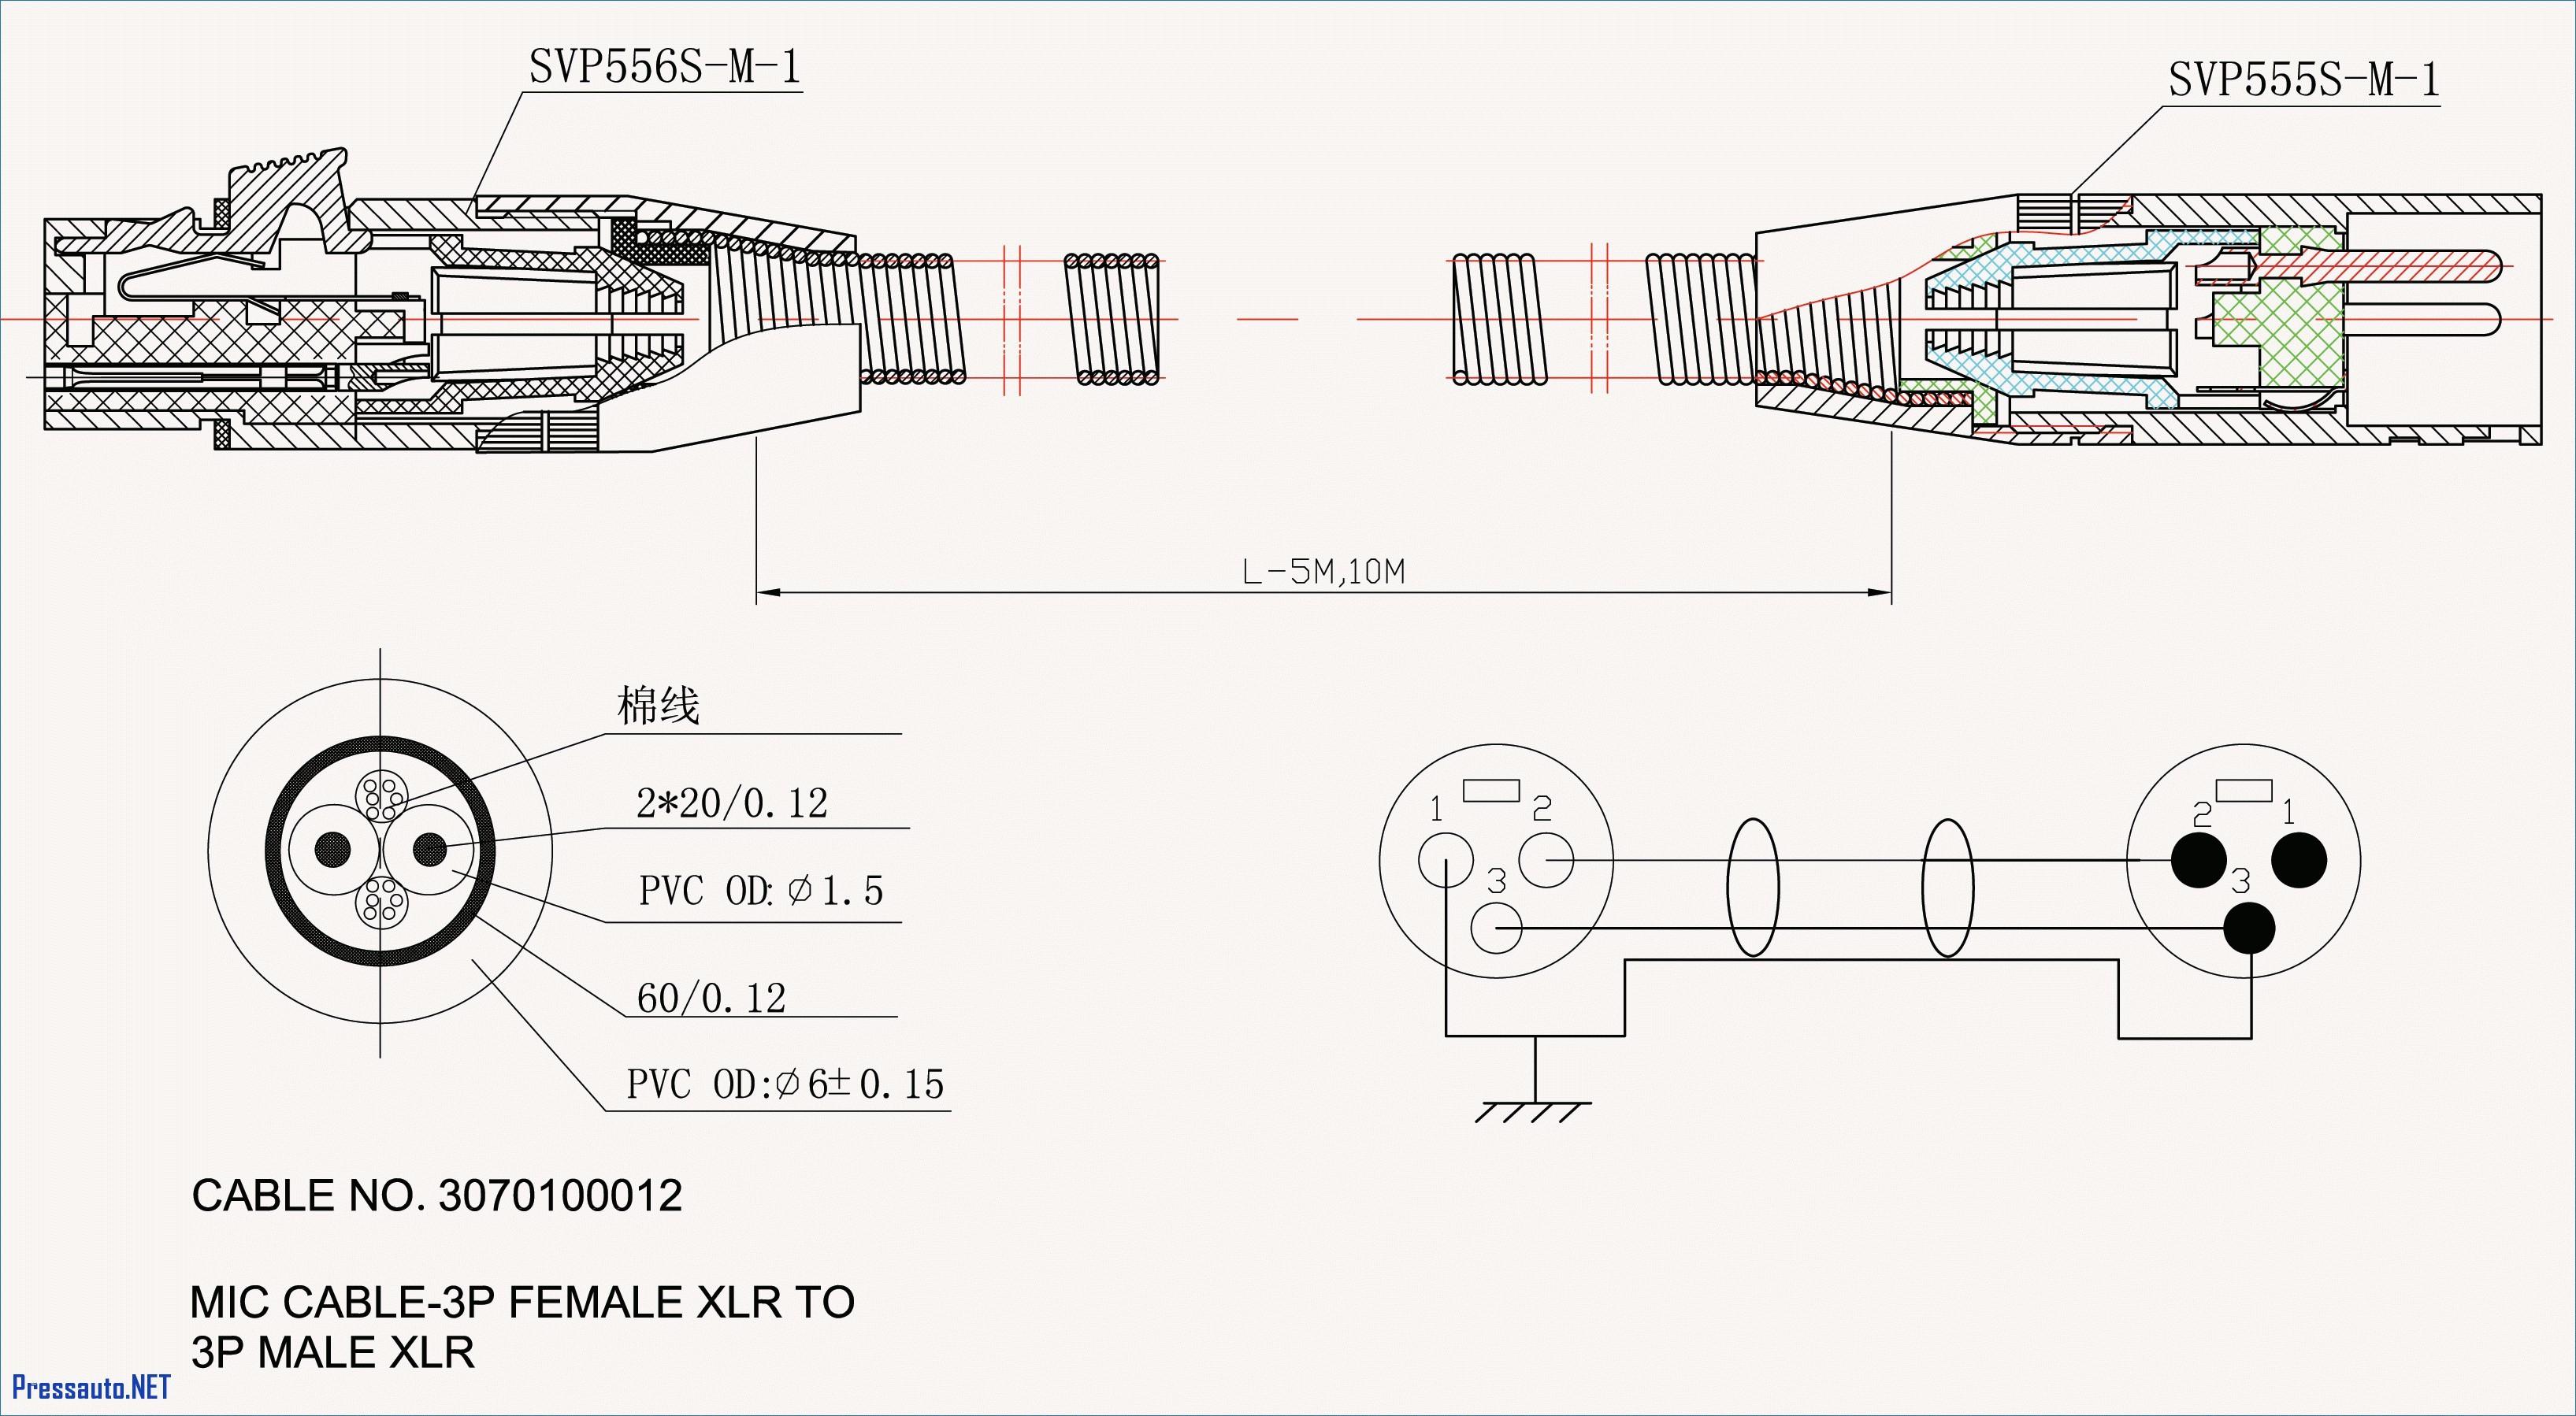 20 Amp Plug Wiring Diagram Collection | Wiring Diagram Sample  Prong Cb Wiring Diagrams on hp wiring diagram, ul wiring diagram, ge wiring diagram, pc wiring diagram, rc wiring diagram, hd wiring diagram, pa wiring diagram, ml wiring diagram, st wiring diagram, td wiring diagram, rg wiring diagram, ccc wiring diagram, mc wiring diagram, hs wiring diagram, ct wiring diagram, wd wiring diagram, tv wiring diagram, bk wiring diagram, cm wiring diagram, ag wiring diagram,